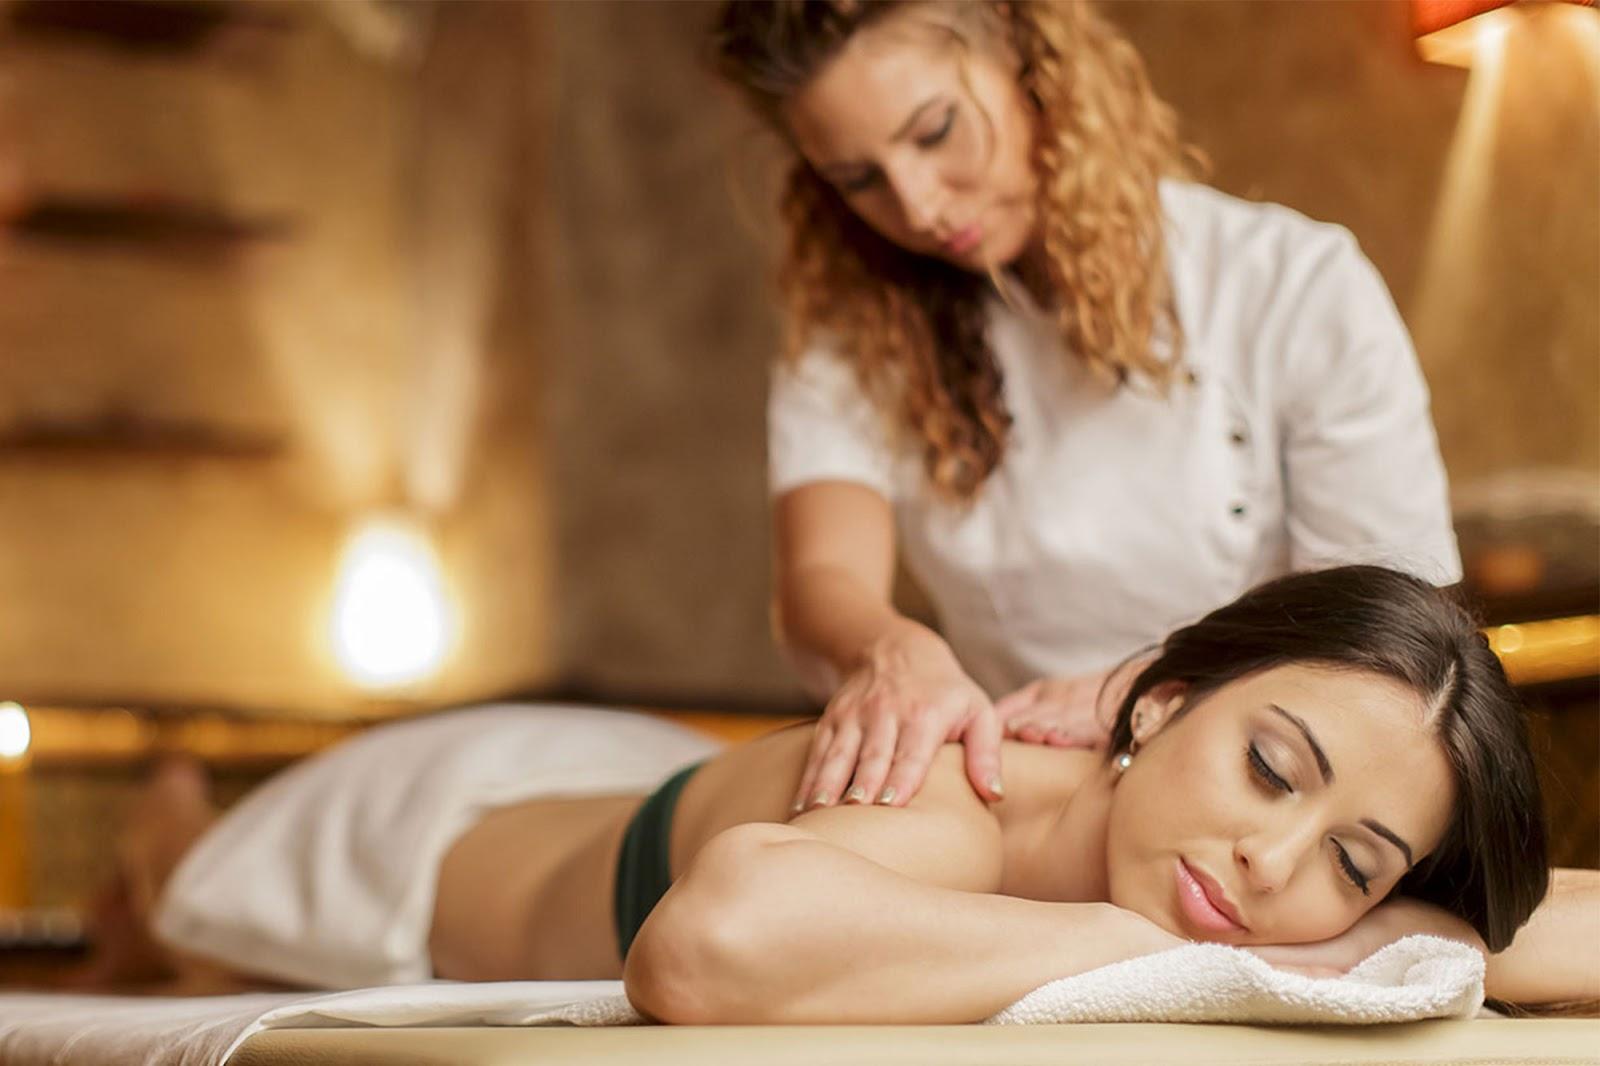 Full Body Massage In